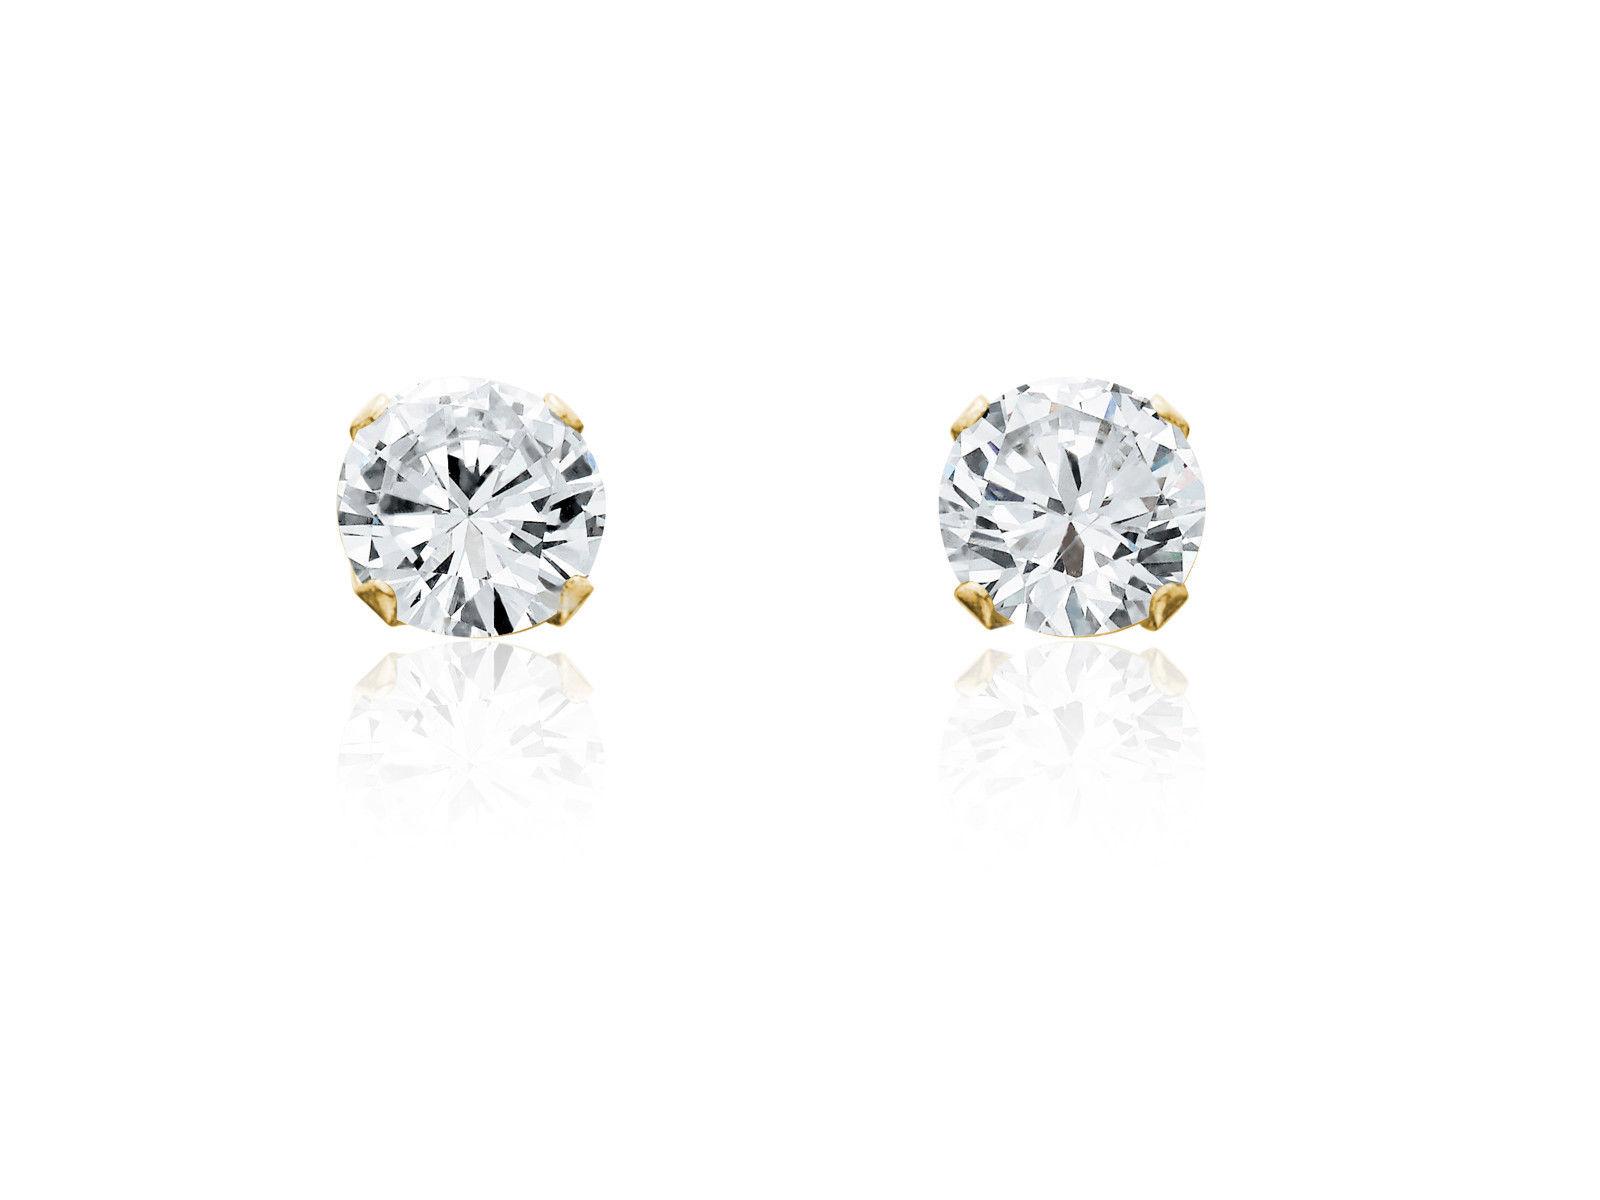 Fine Jewelry 7mm Cubic Zirconia Stud Earrings 14K Gold Gb7XkMJCIx